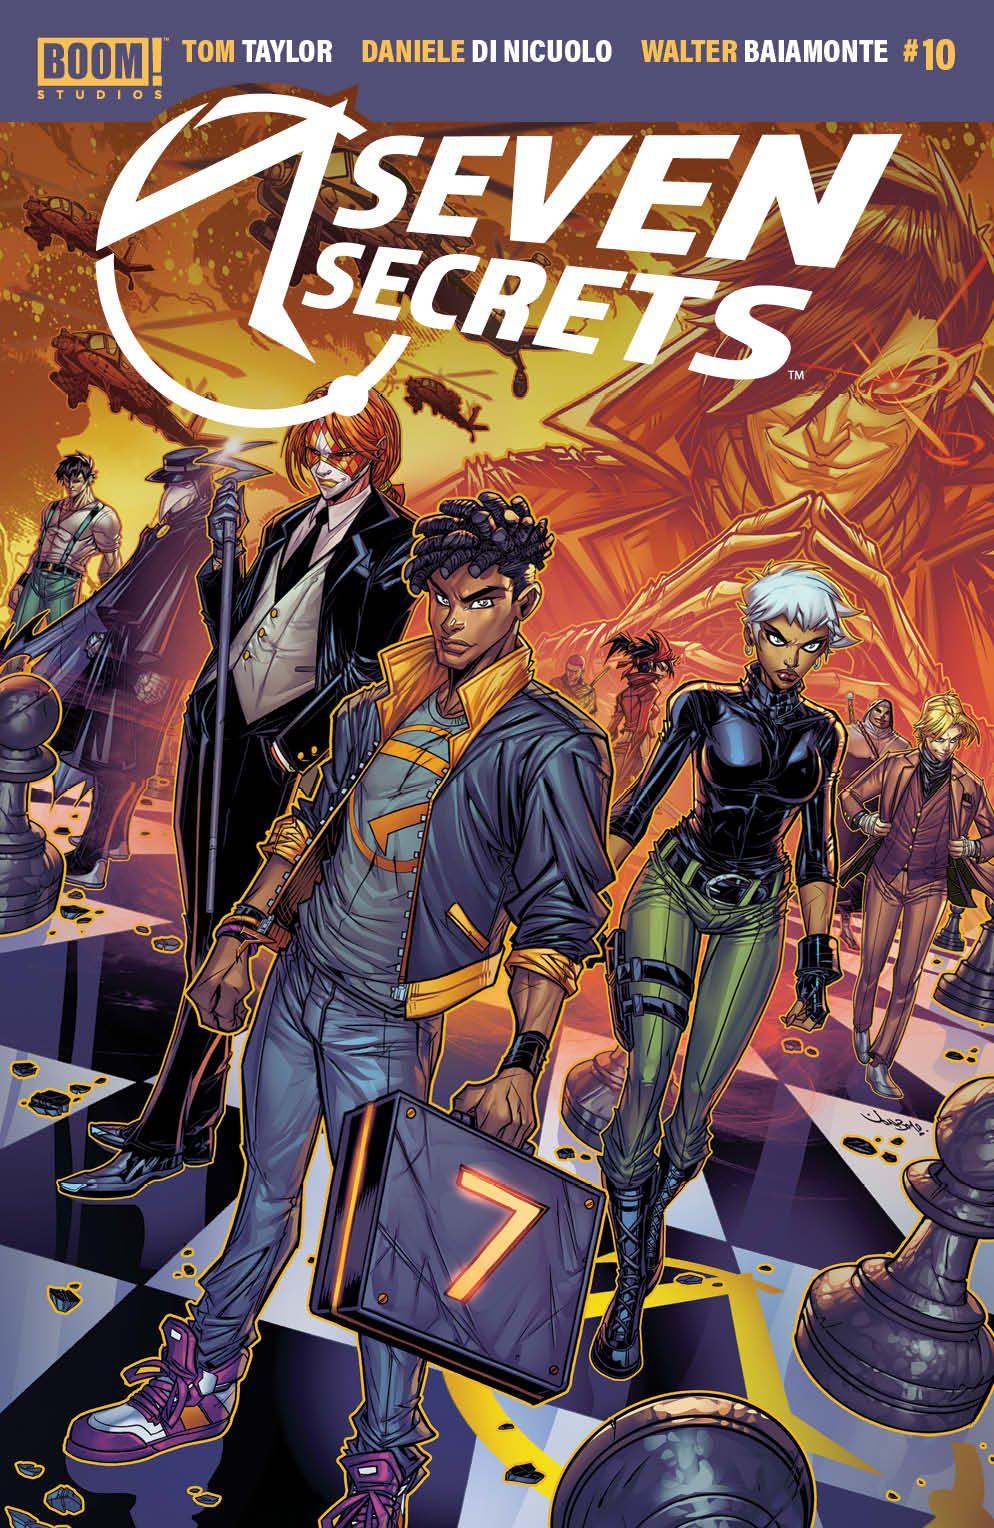 SevenSecrets_010_Cover_B_Variant ComicList Previews: SEVEN SECRETS #10